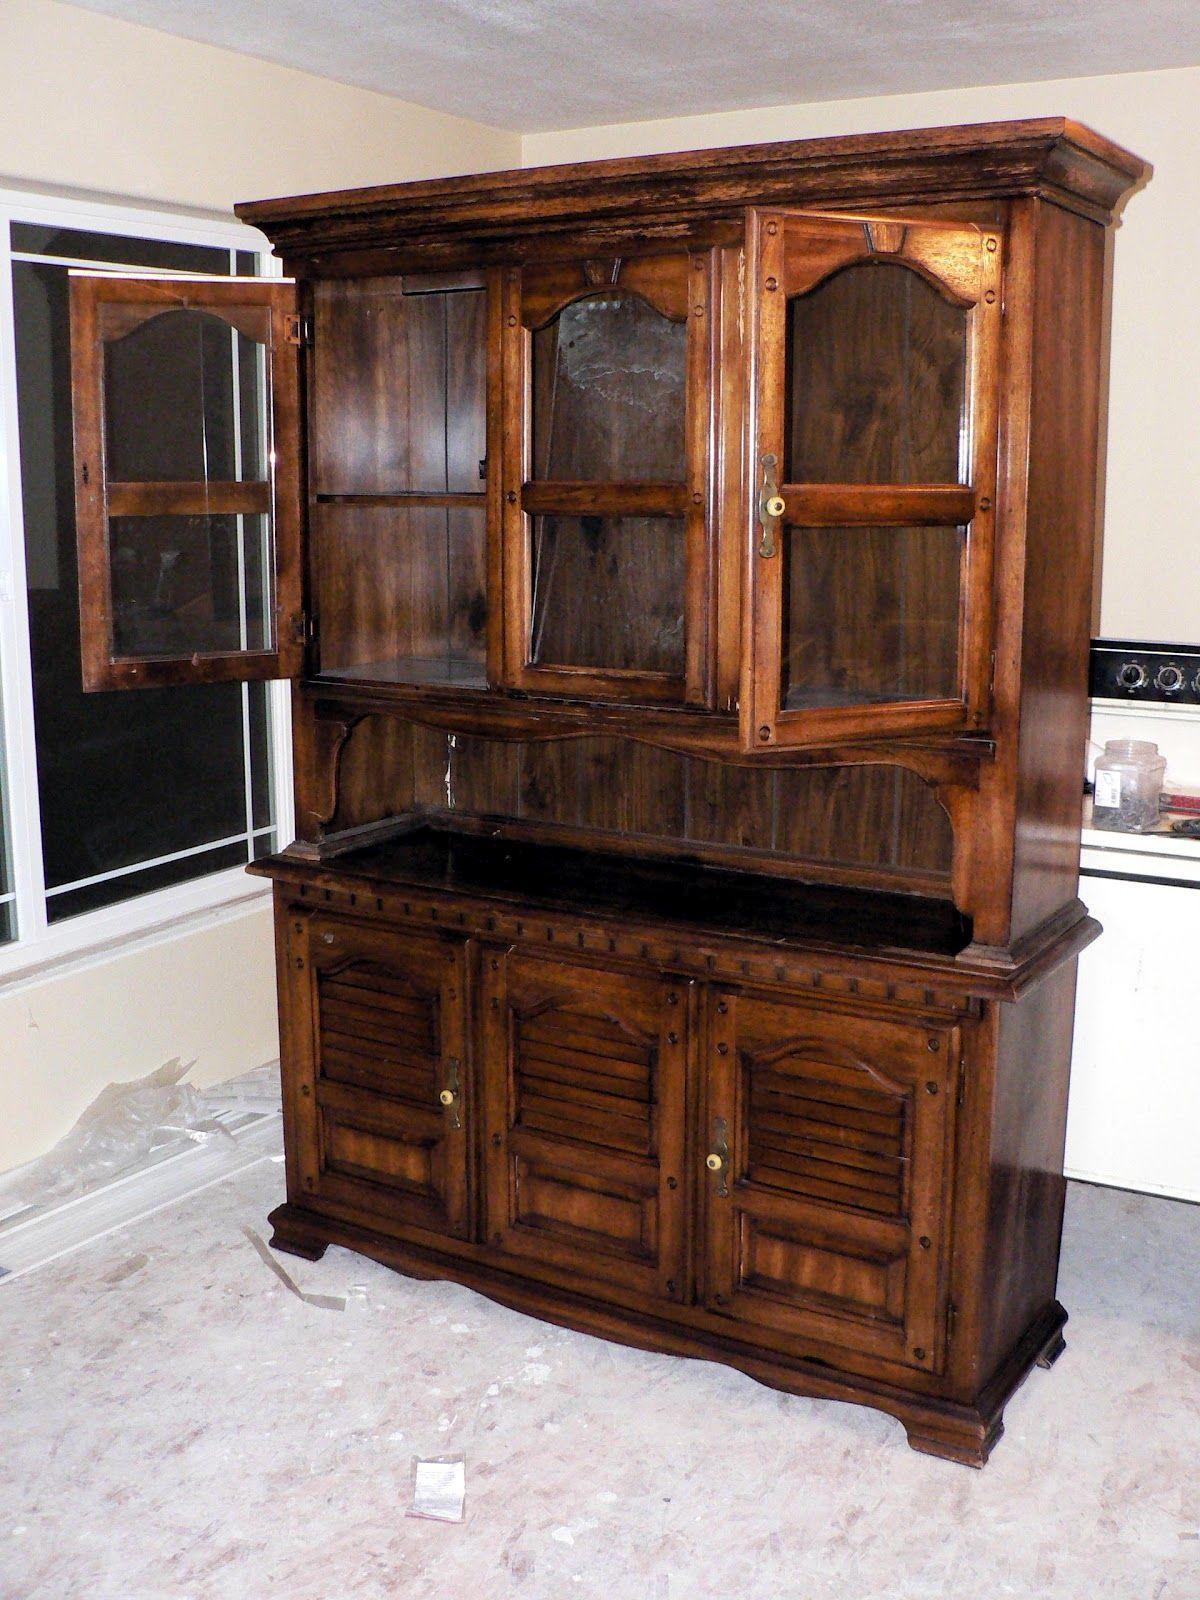 How to Paint Furniture Furniture, Paint furniture